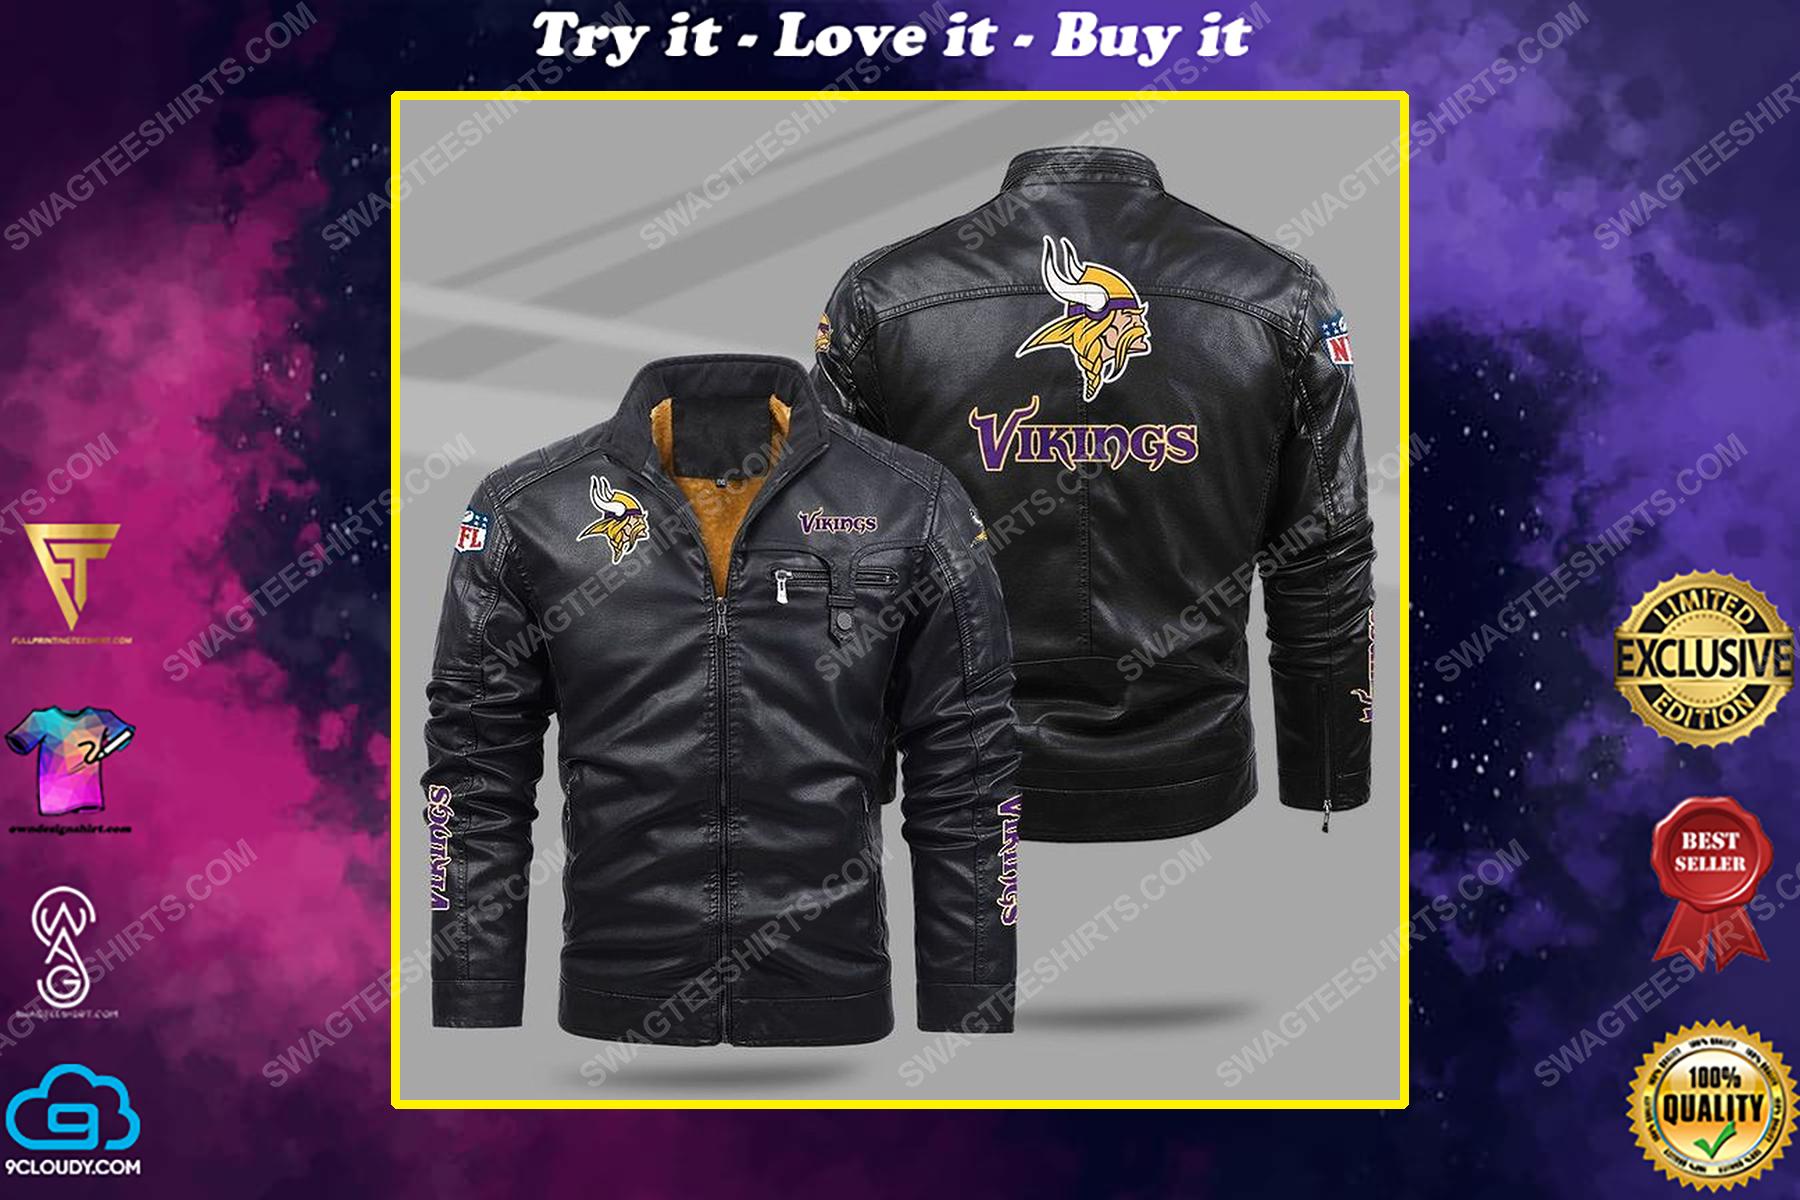 The minnesota vikings nfl all over print fleece leather jacket